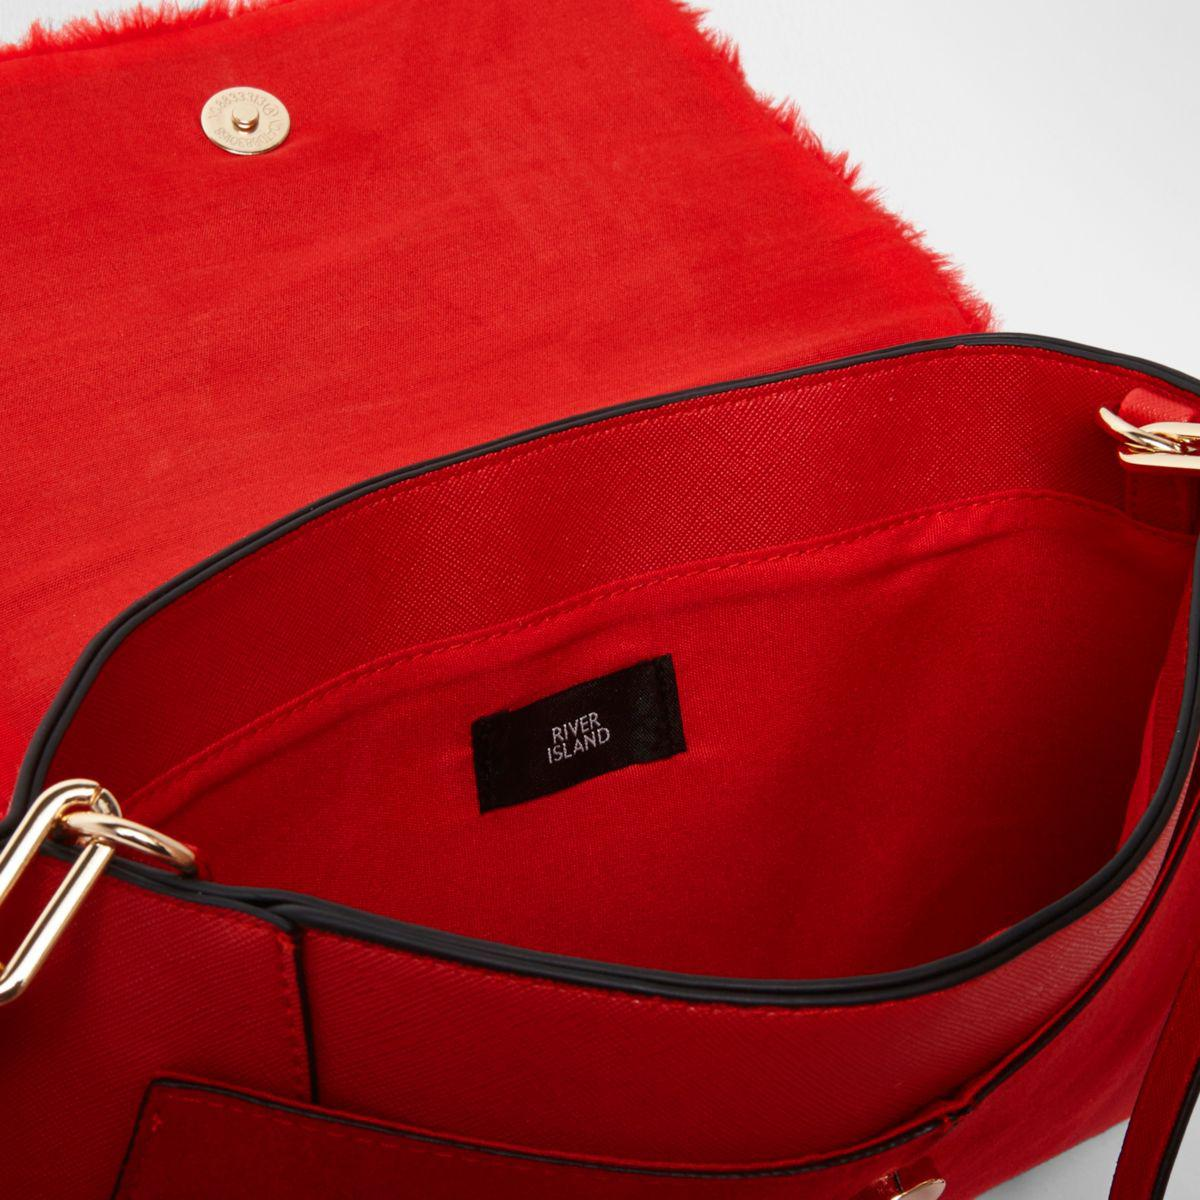 Lyst - River Island Red Faux Fur Flap Envelope Clutch Bag Red Faux ... 17b65d3c6f1a2